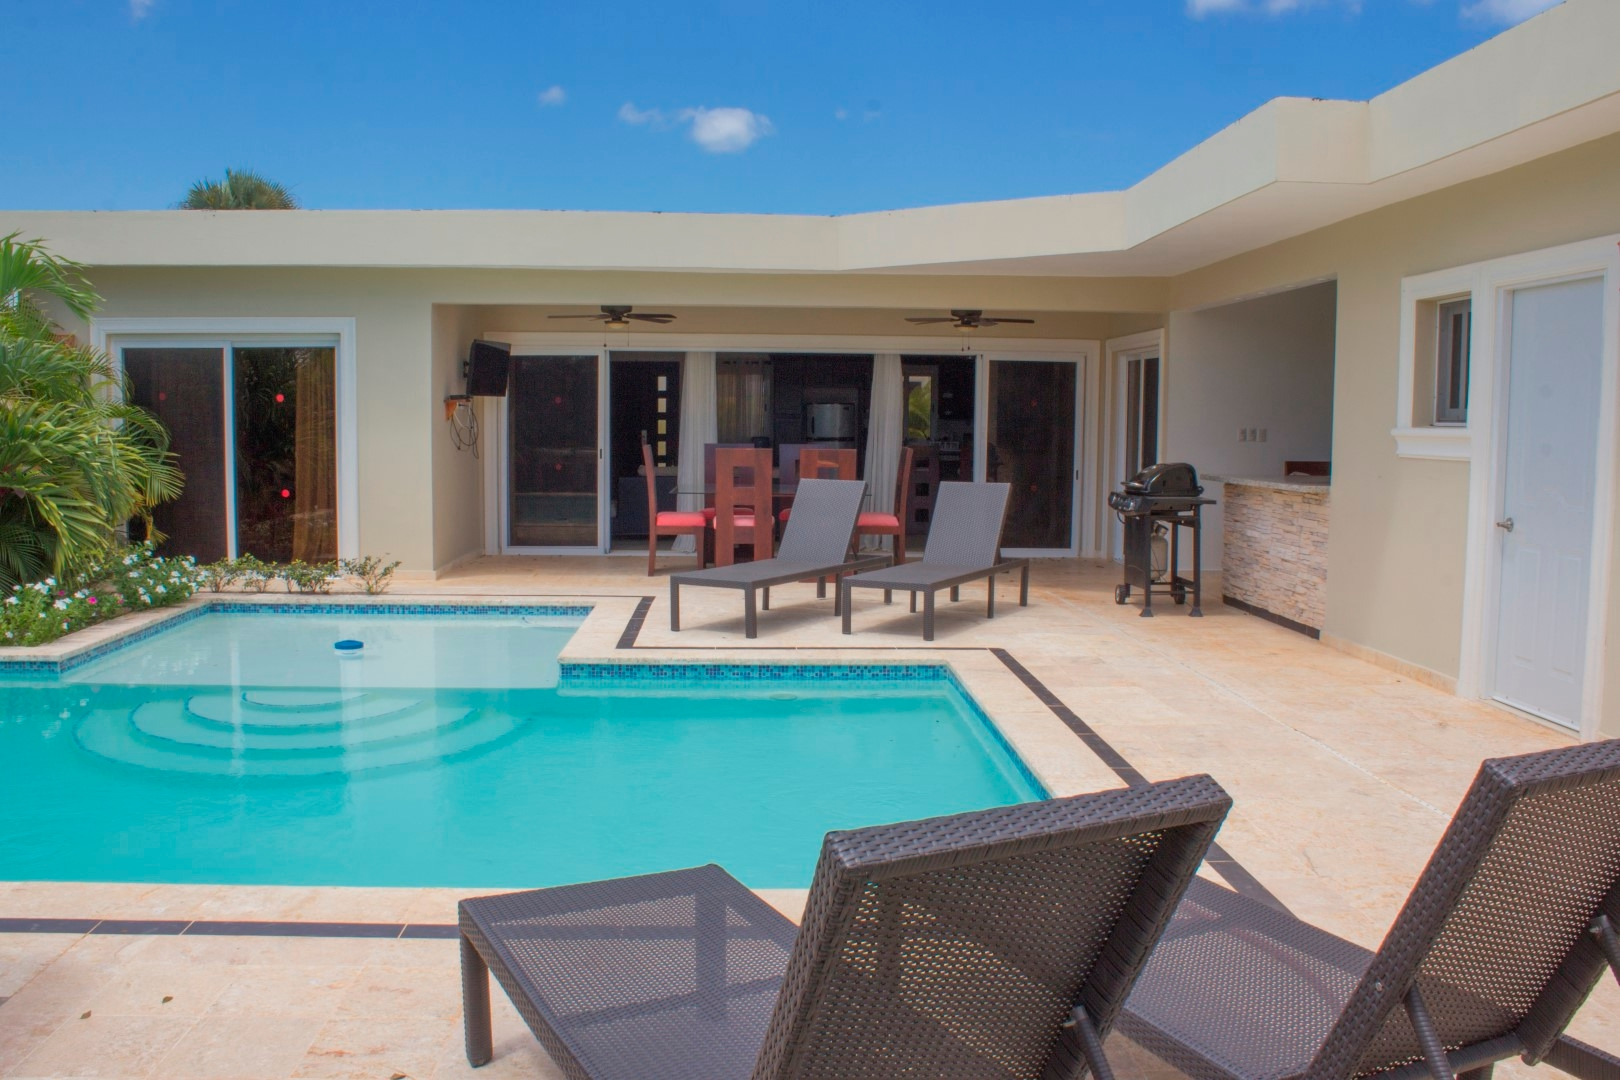 3 Bedroom vacation Villa in Sosua